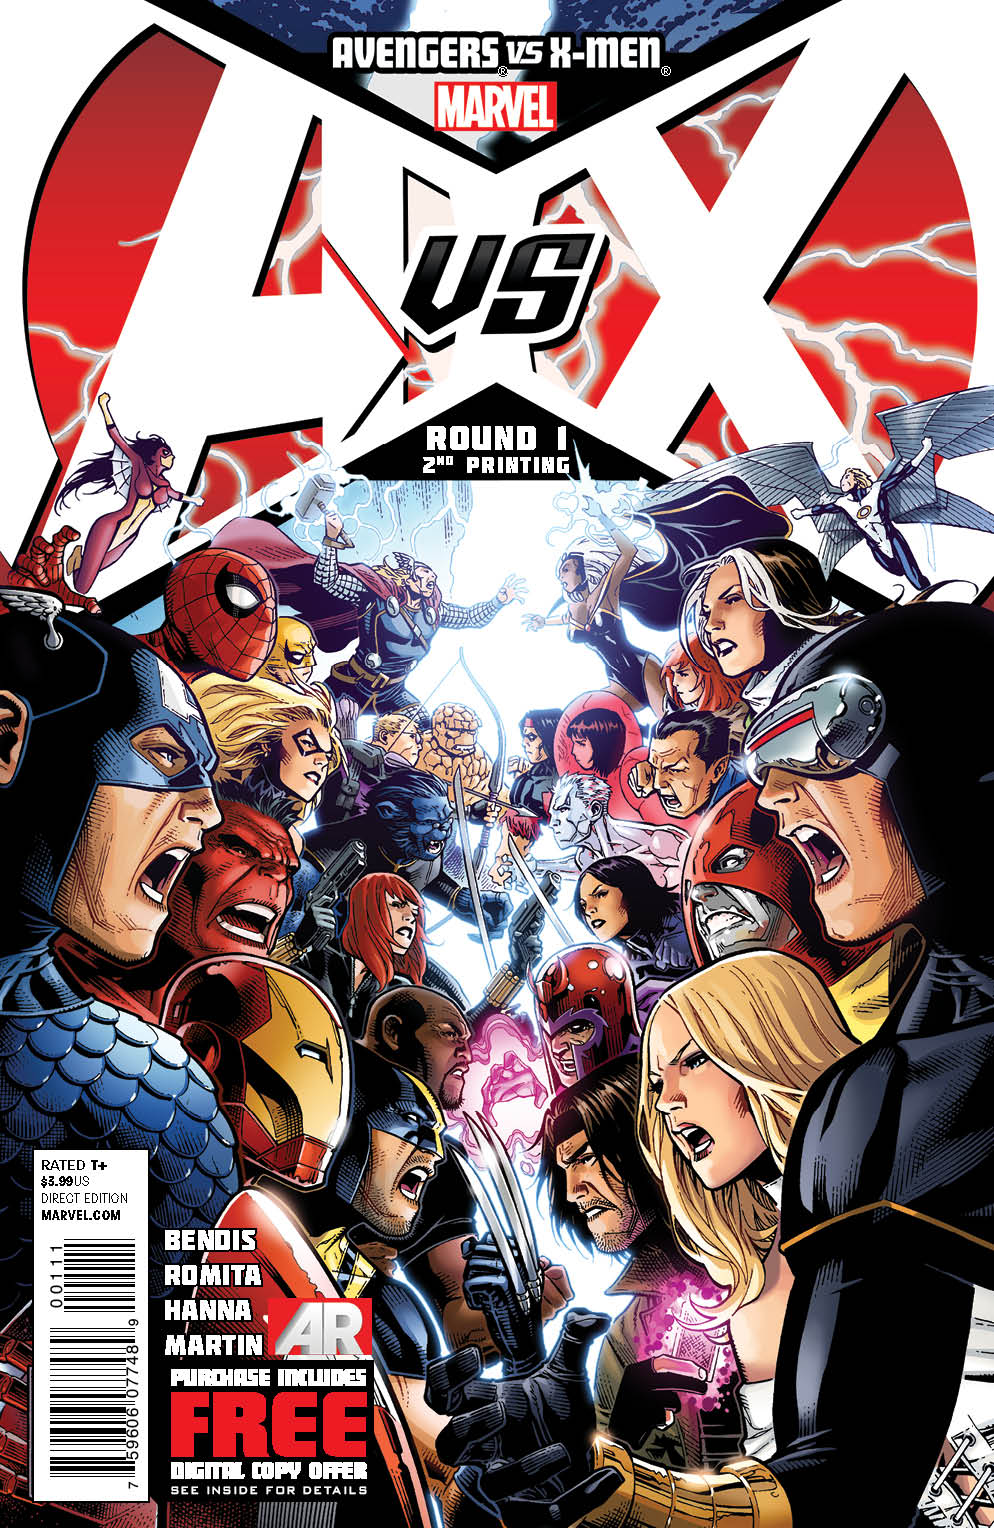 AvengersVSXMen_1_SecondPrintingCover AVENGERS VS. X-MEN second printings rushed to stores